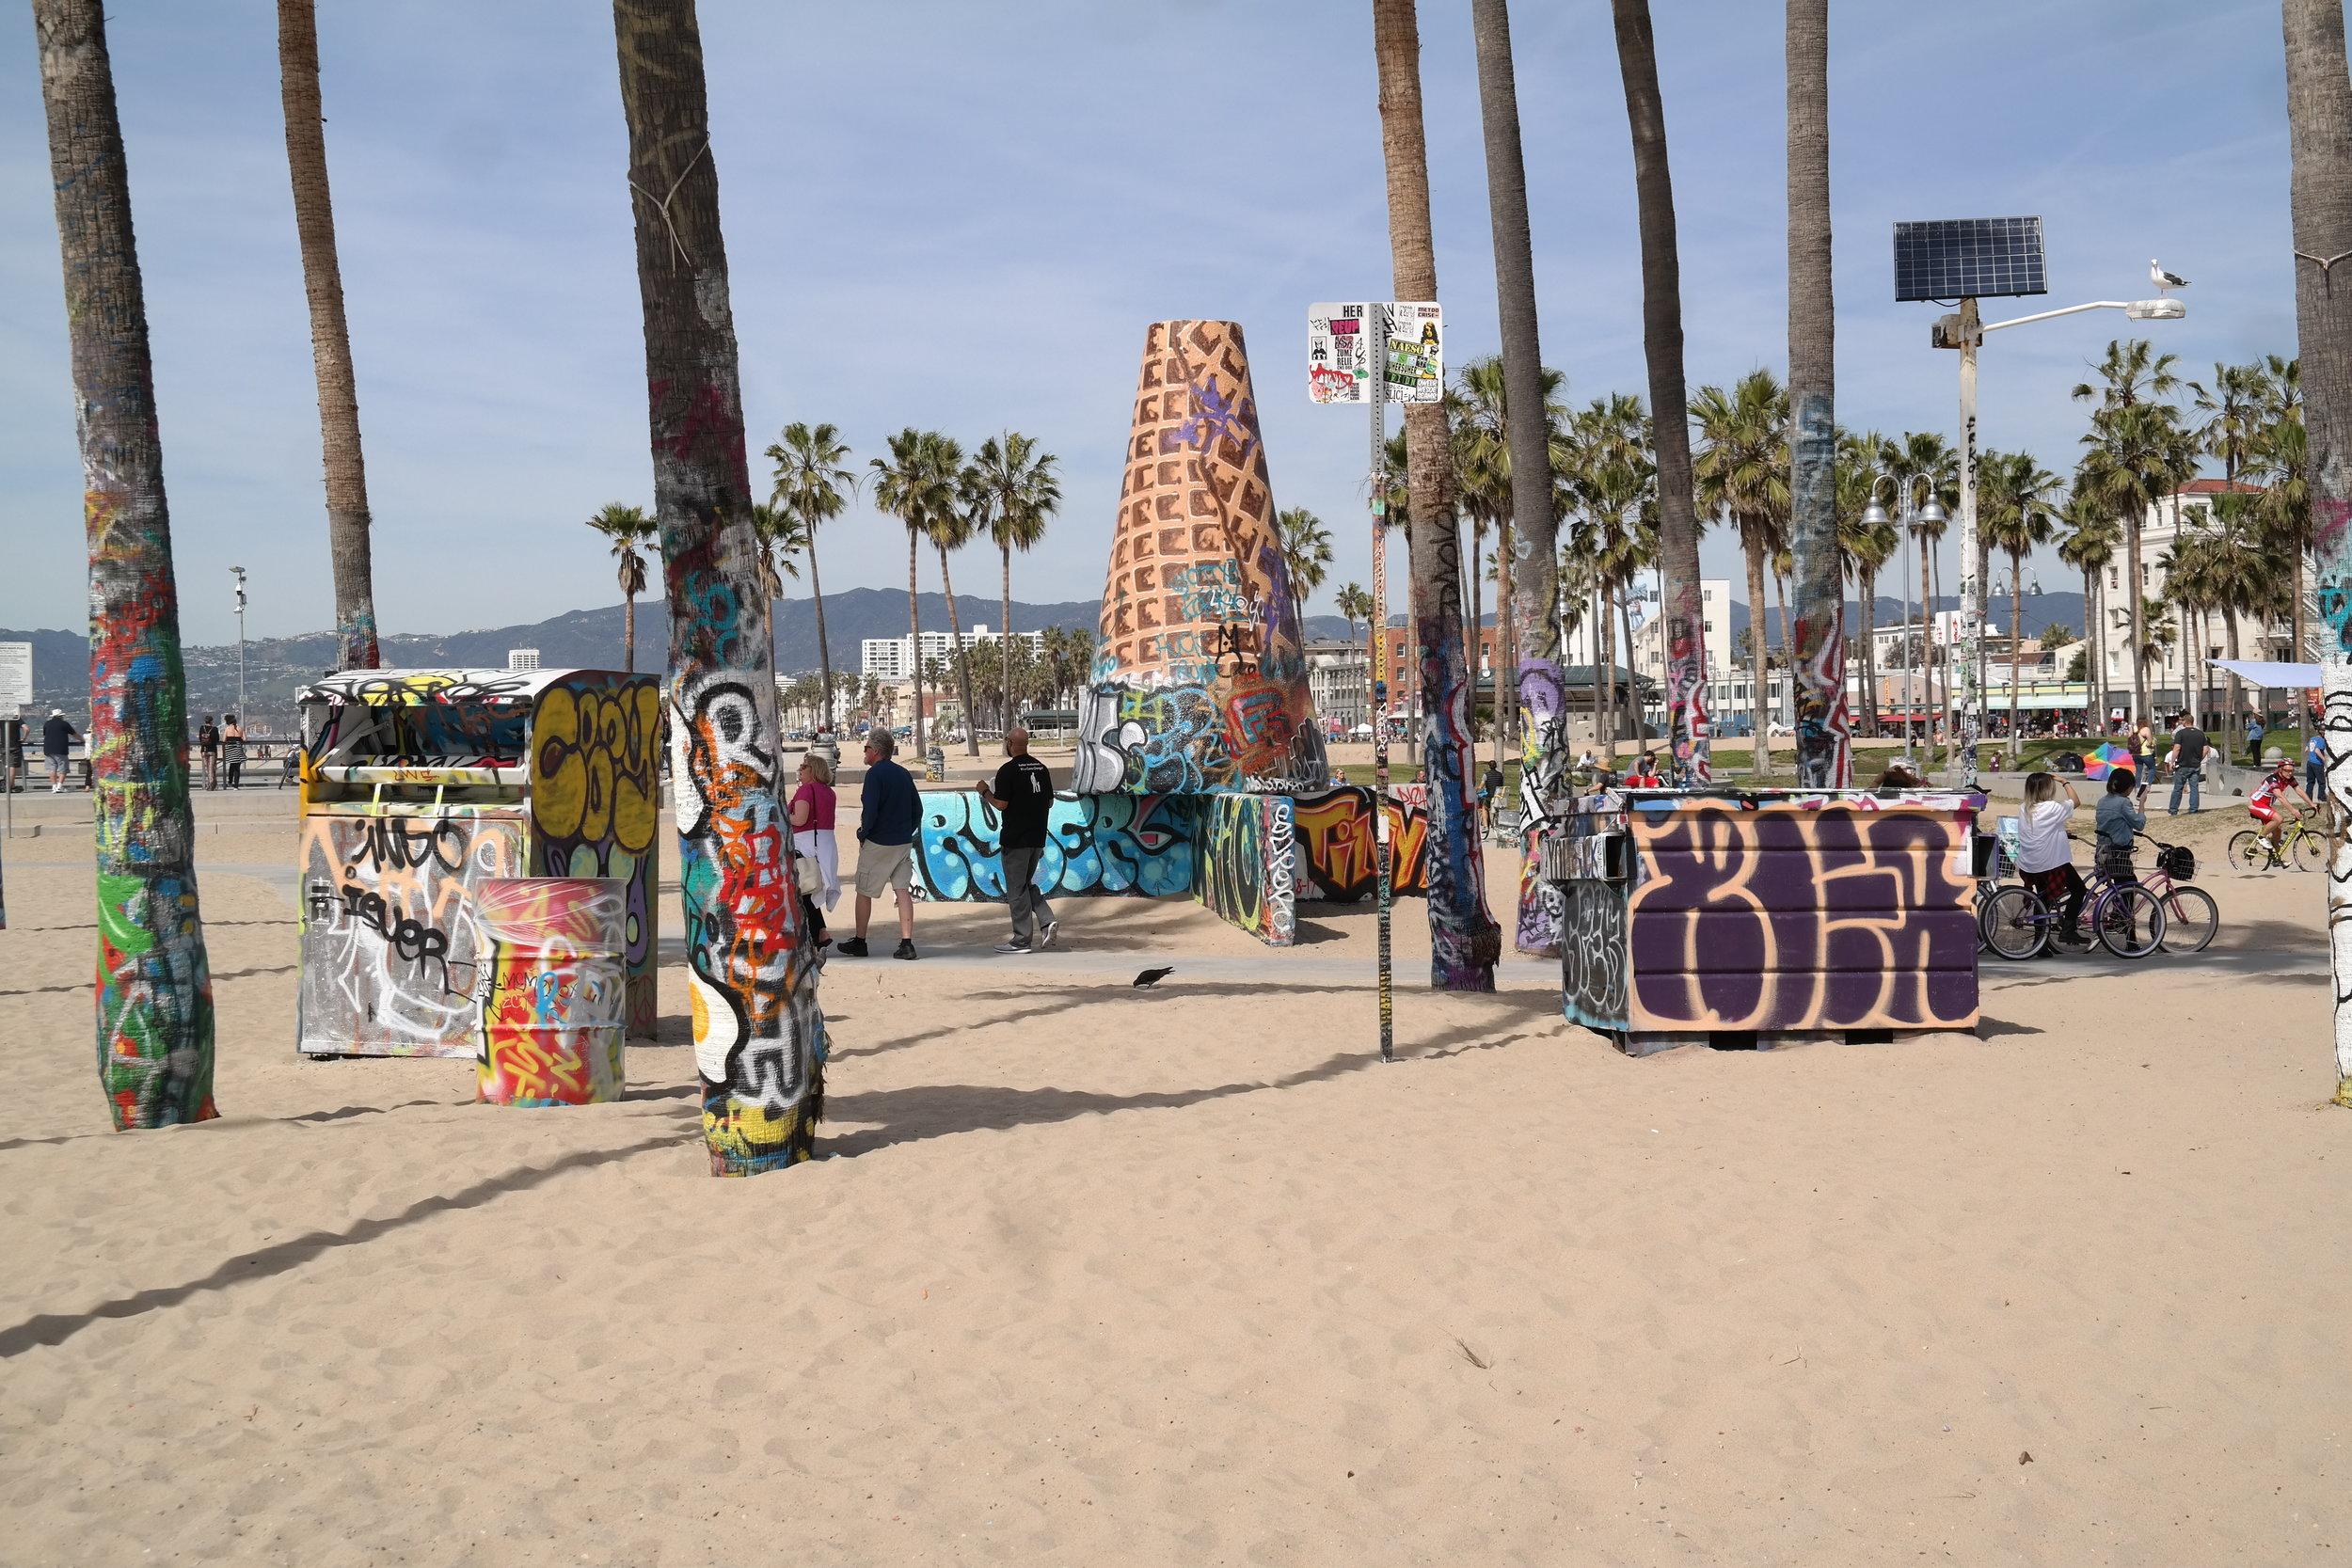 Public Art Walls in Venice Beach.